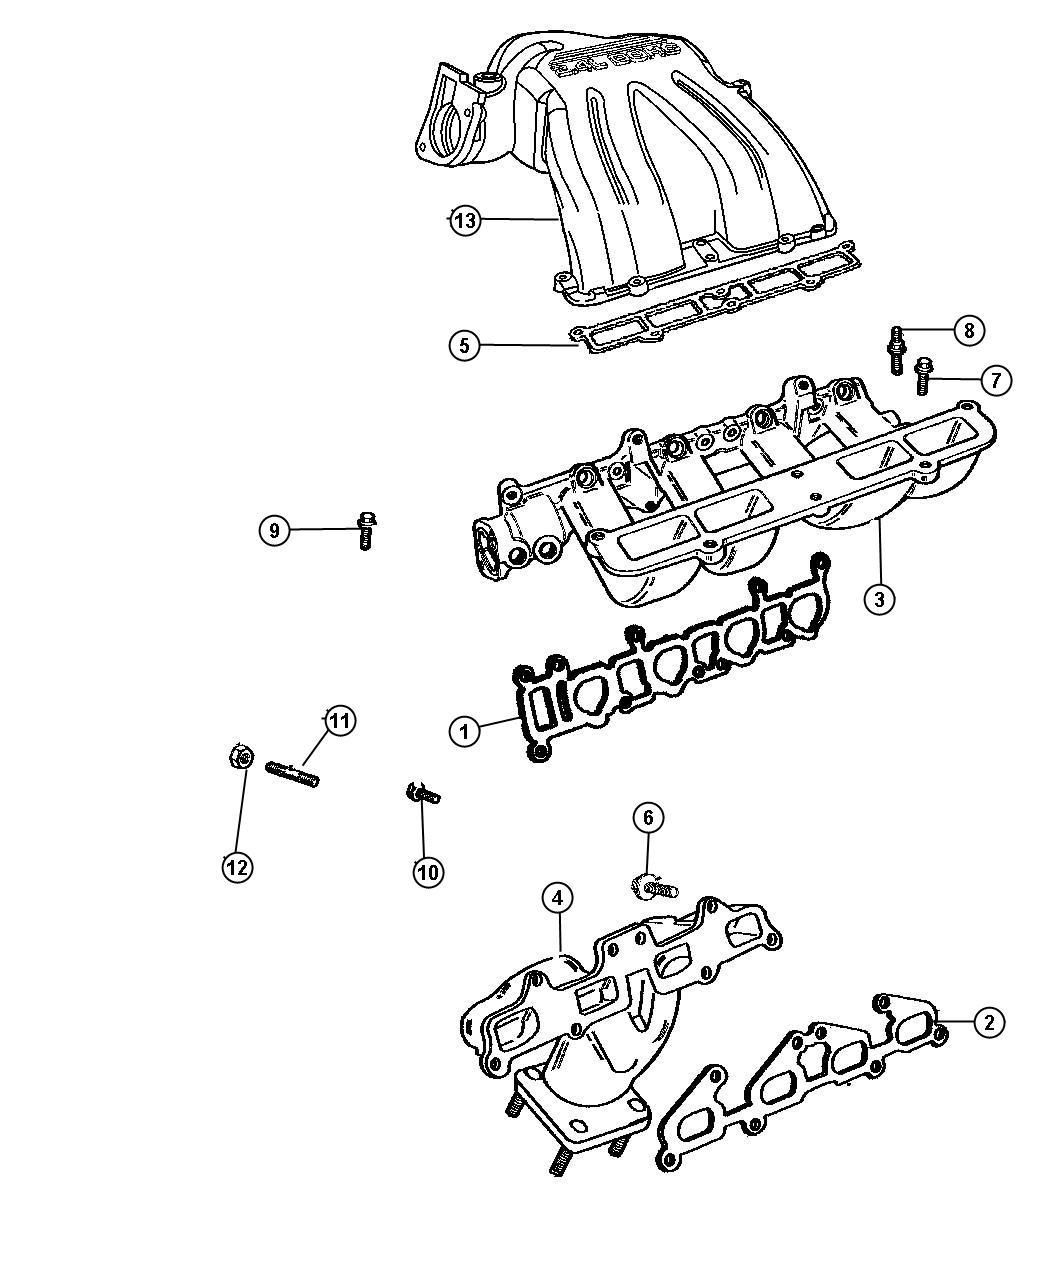 Oem Dodge Caravan Right Exhaust Manifold 4448909: 2005 Dodge Caravan Manifolds, Intake And Exhaust 2.4L [EDZ]